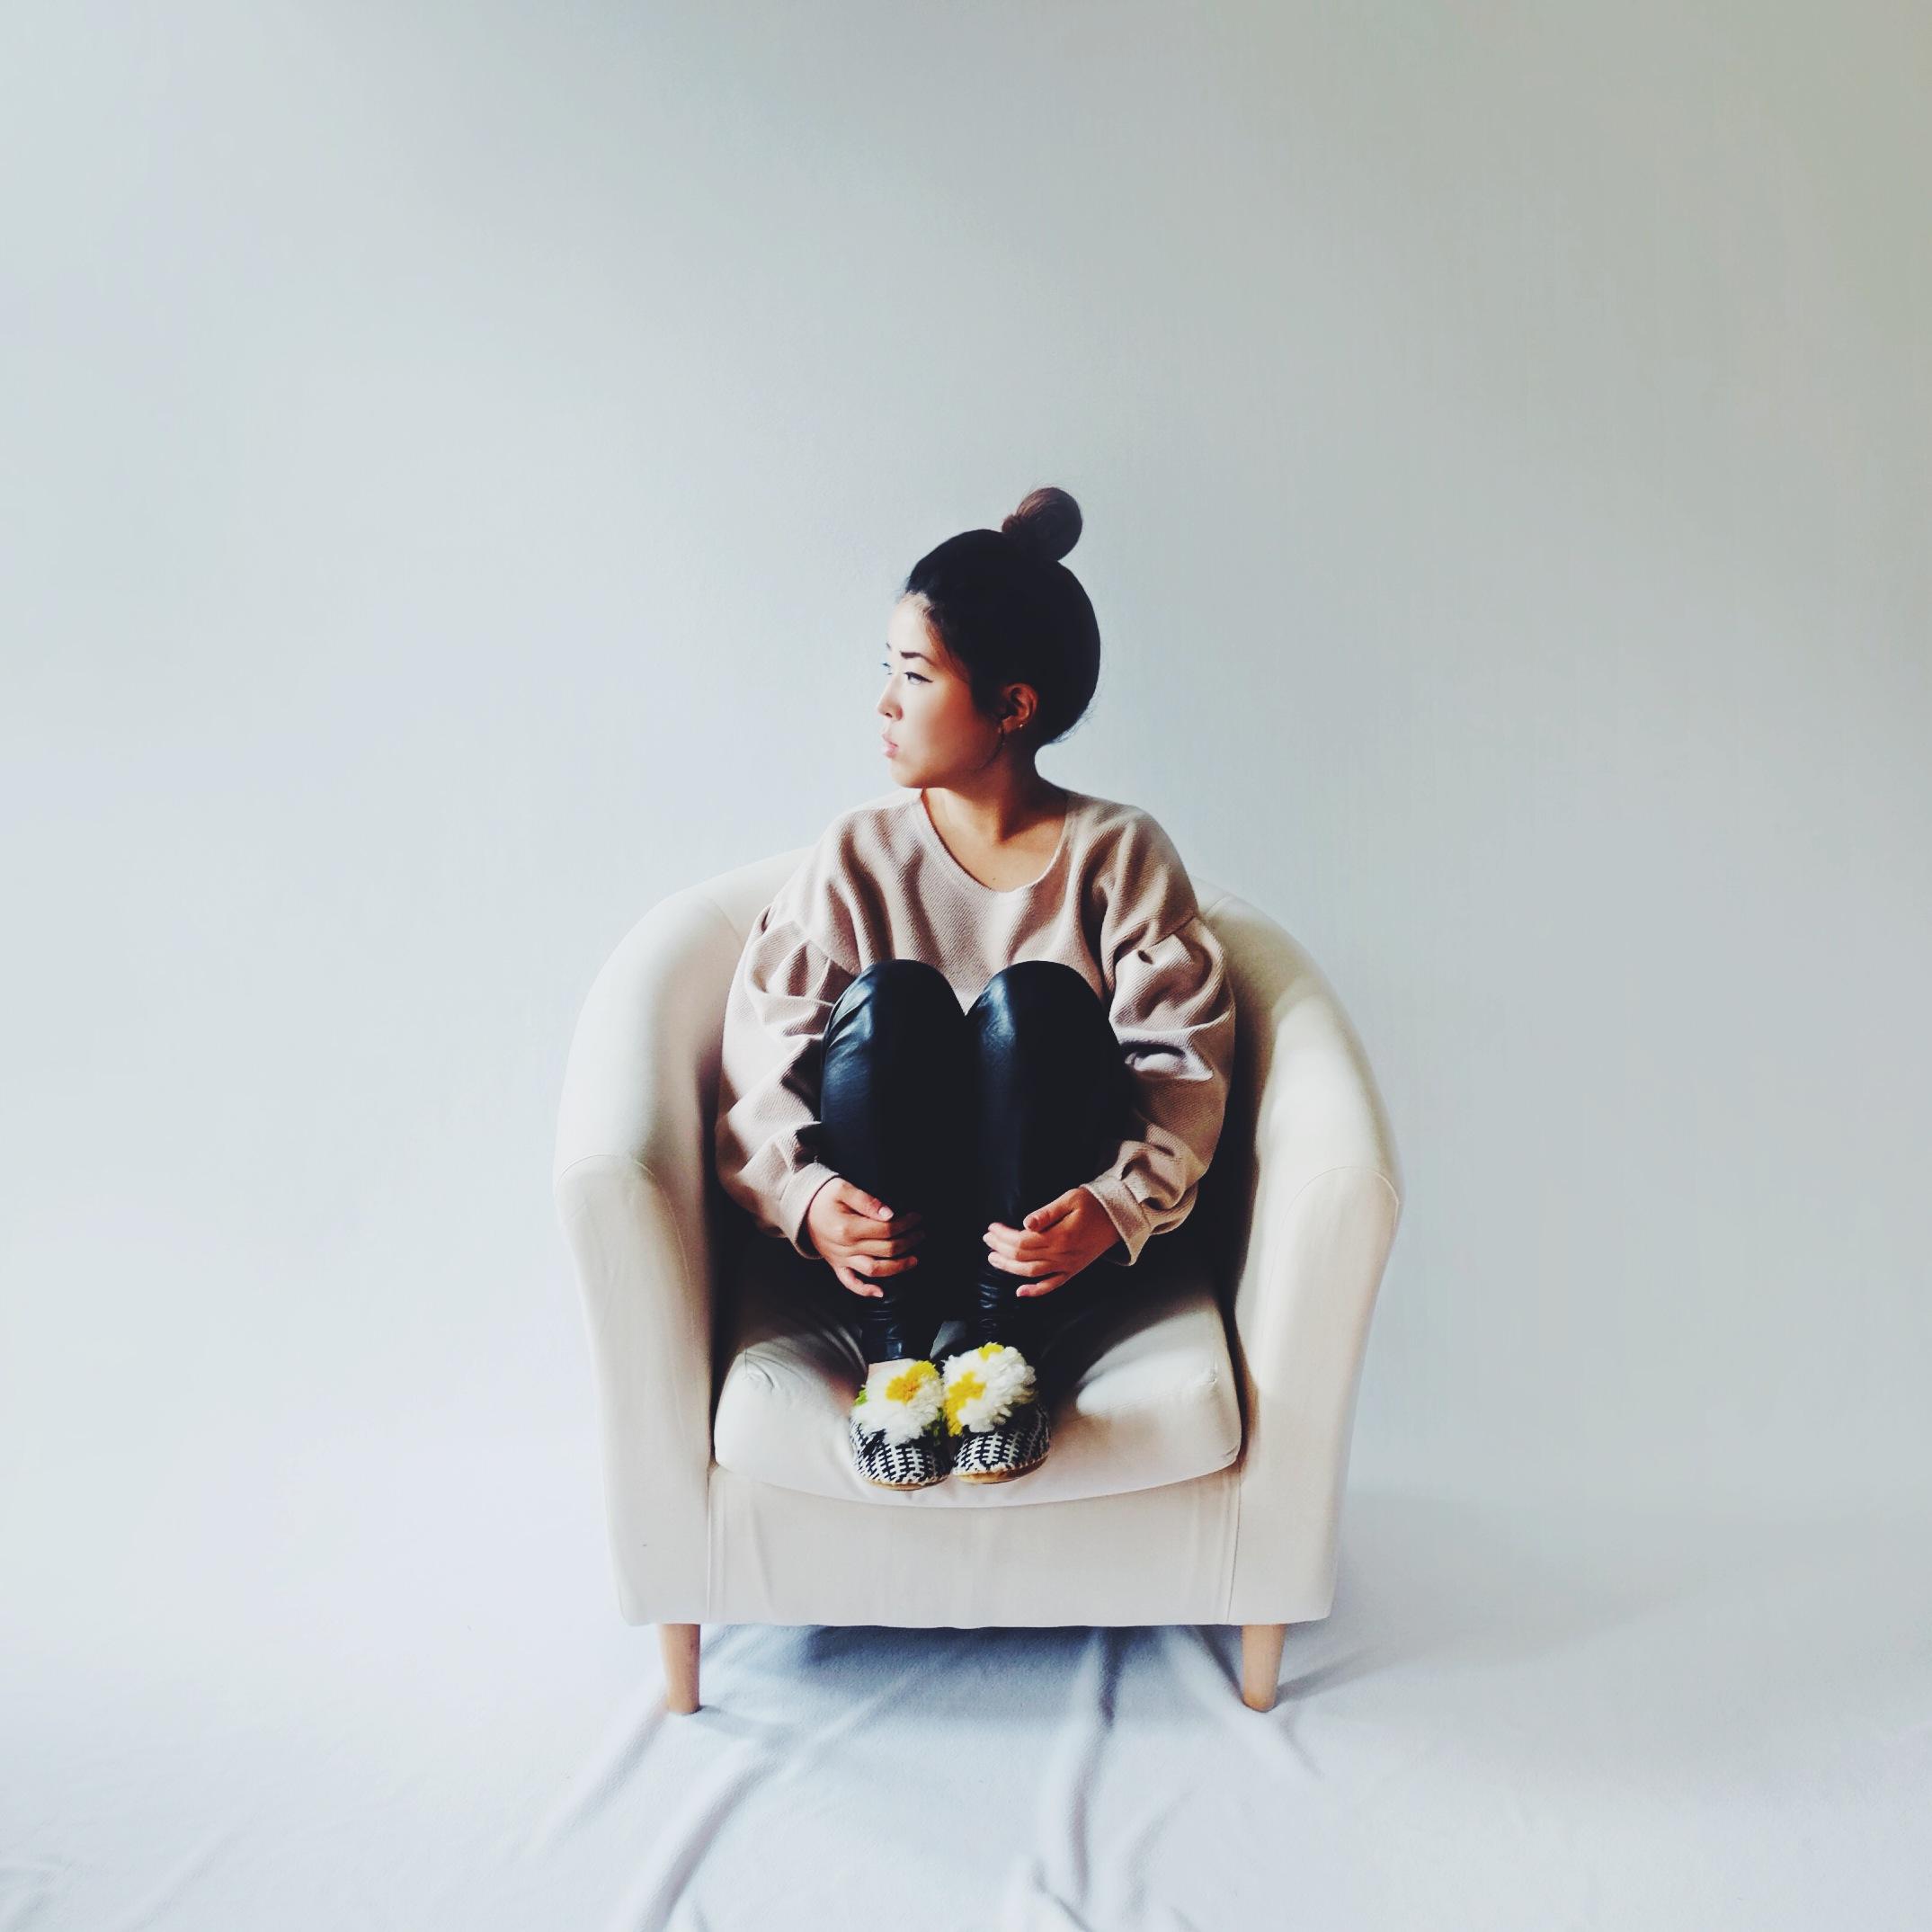 janette kim_blank canvas